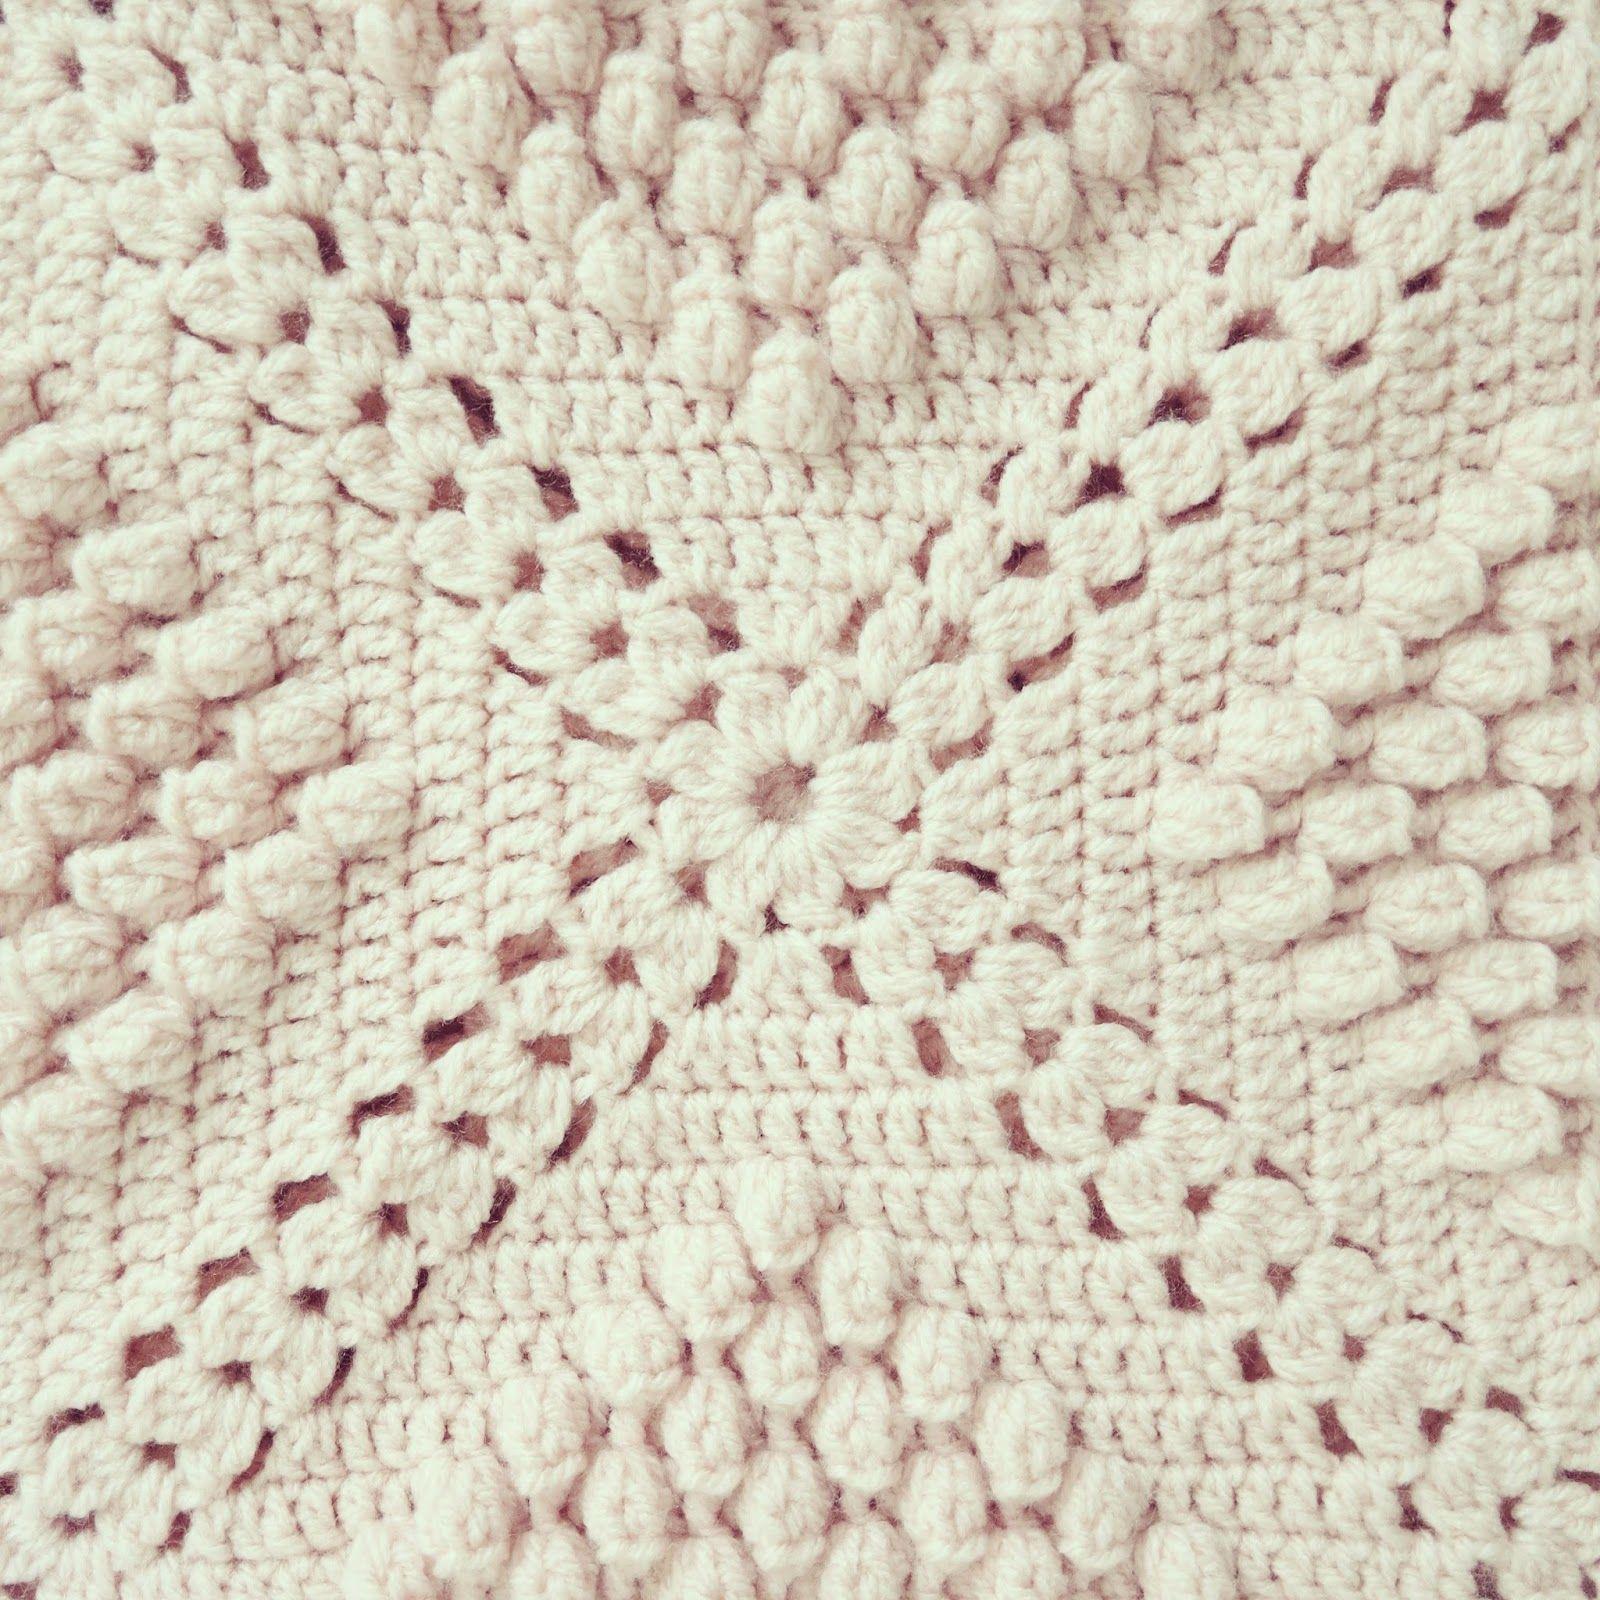 Byhaafner crochet popcorn bobble stitch throw blanket powder byhaafner crochet popcorn bobble stitch throw blanket powder pink pattern bankloansurffo Choice Image